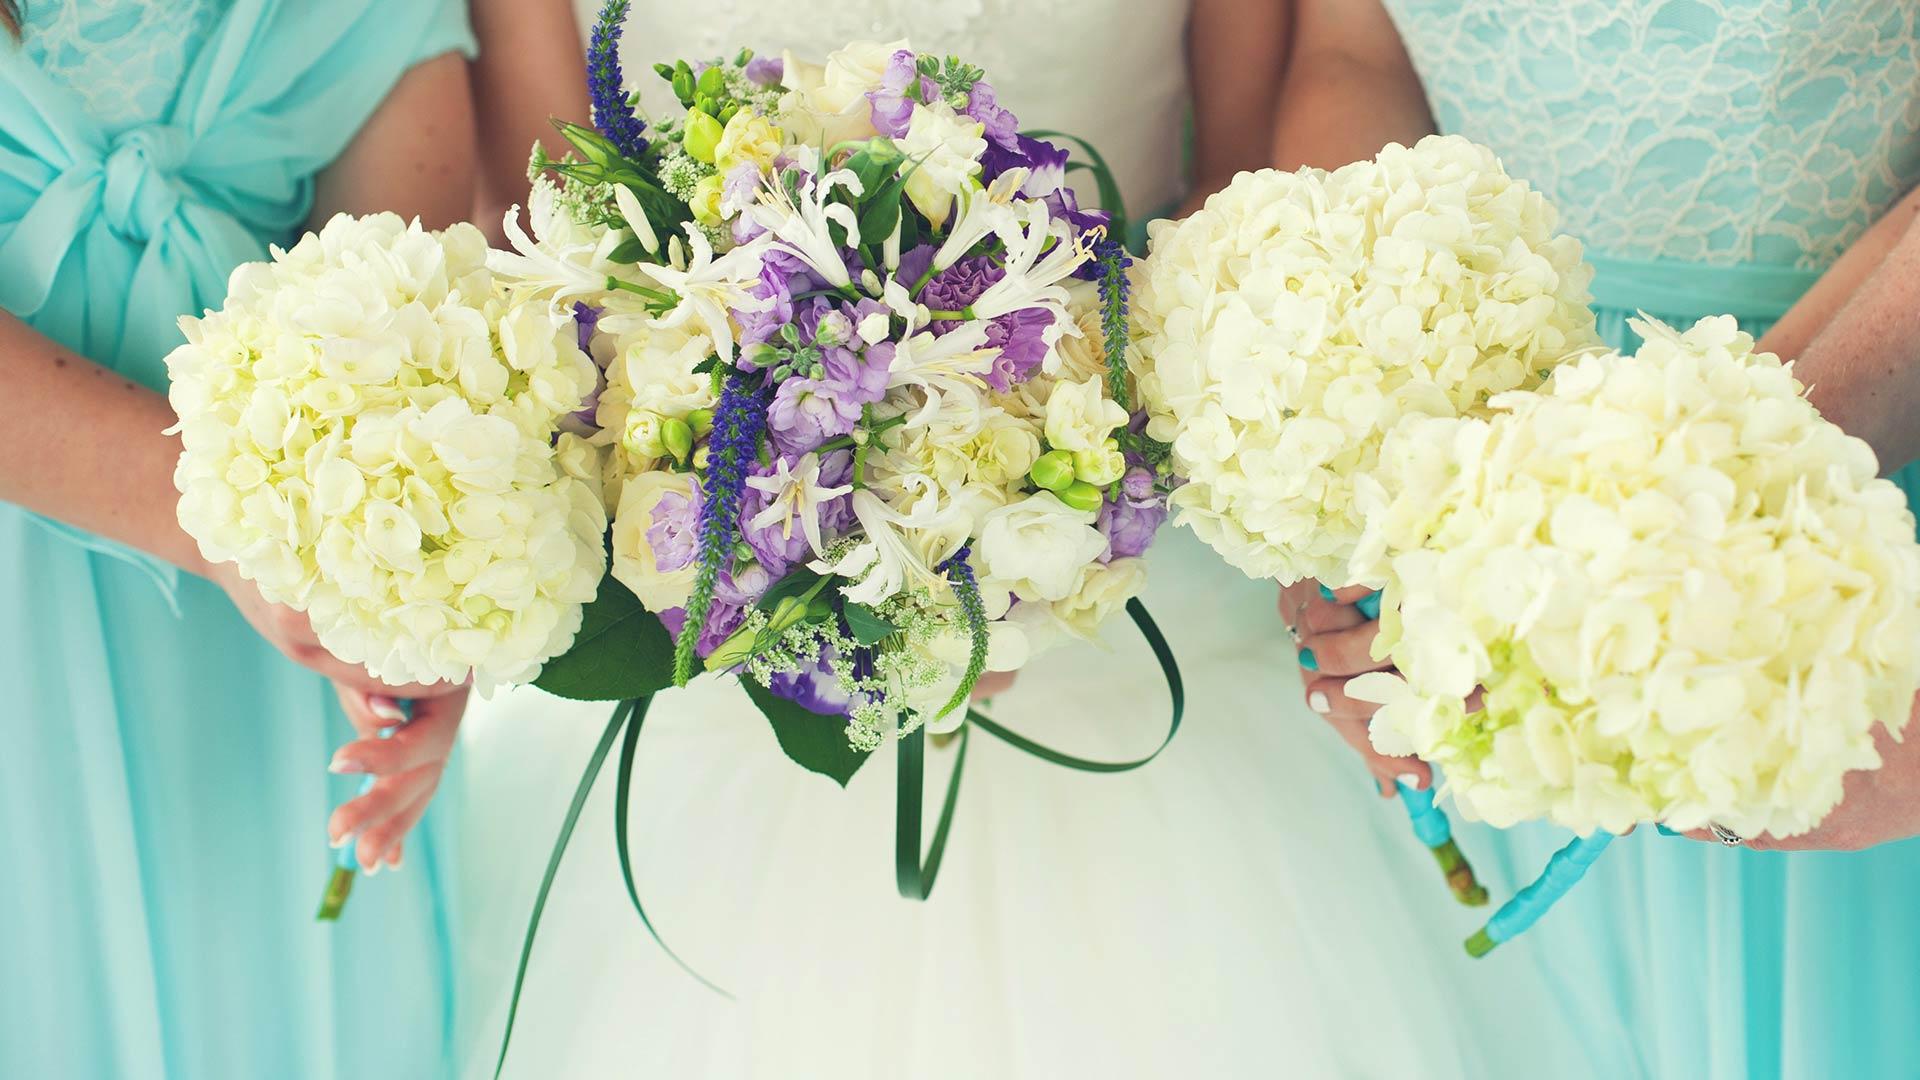 http://fantasticblooms.com/wp-content/uploads/wedding-bouquet-flower-preservation.jpg